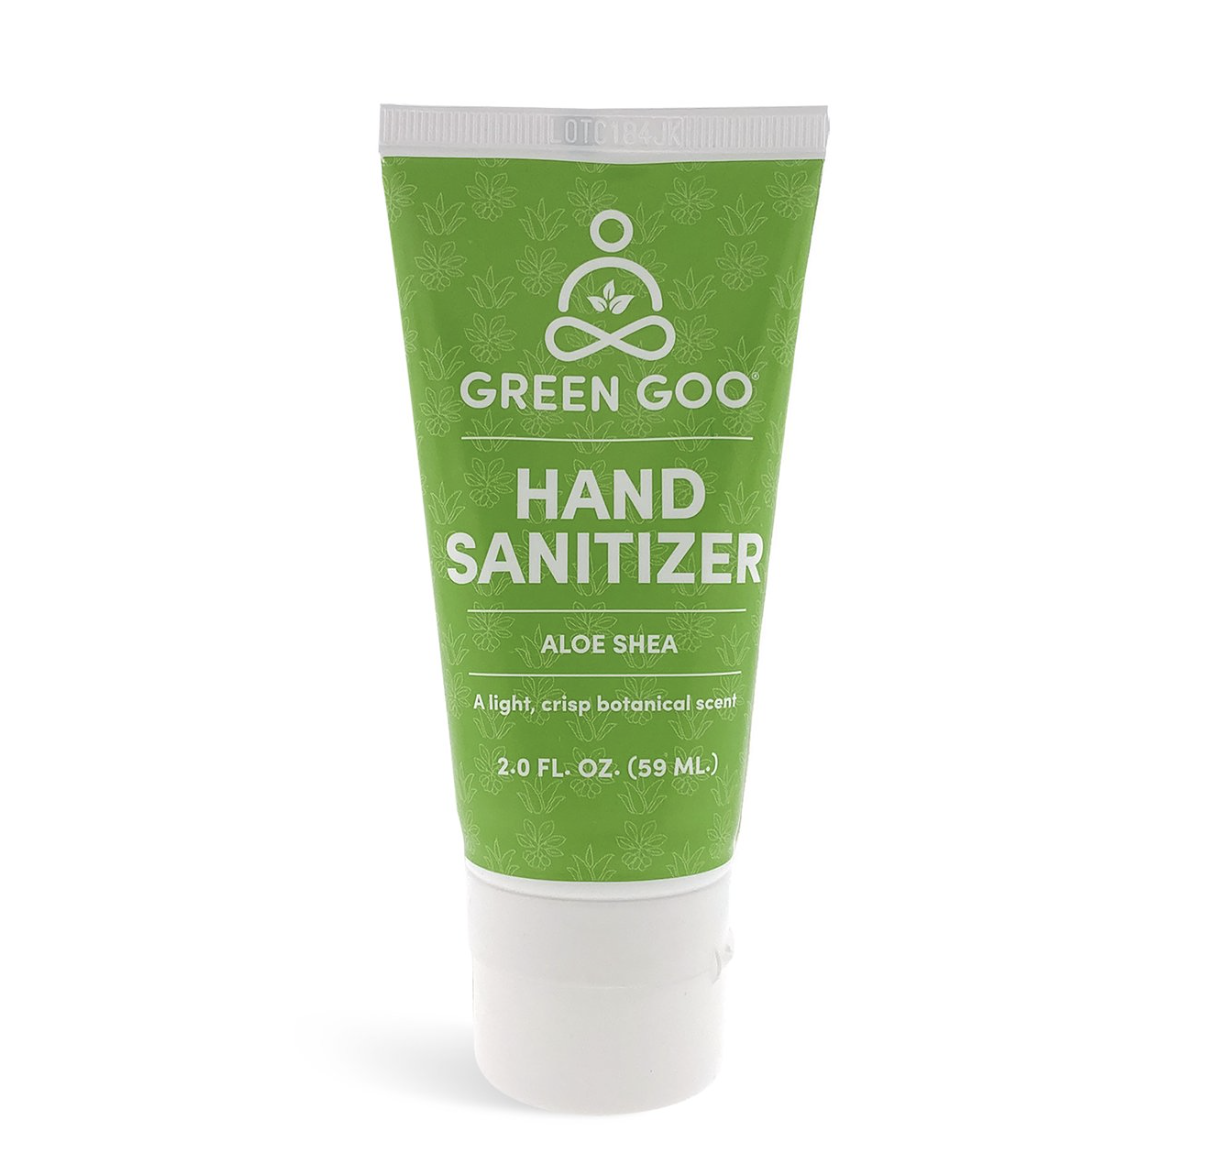 Hand Sanitizer 2oz Gel Aloe Shea